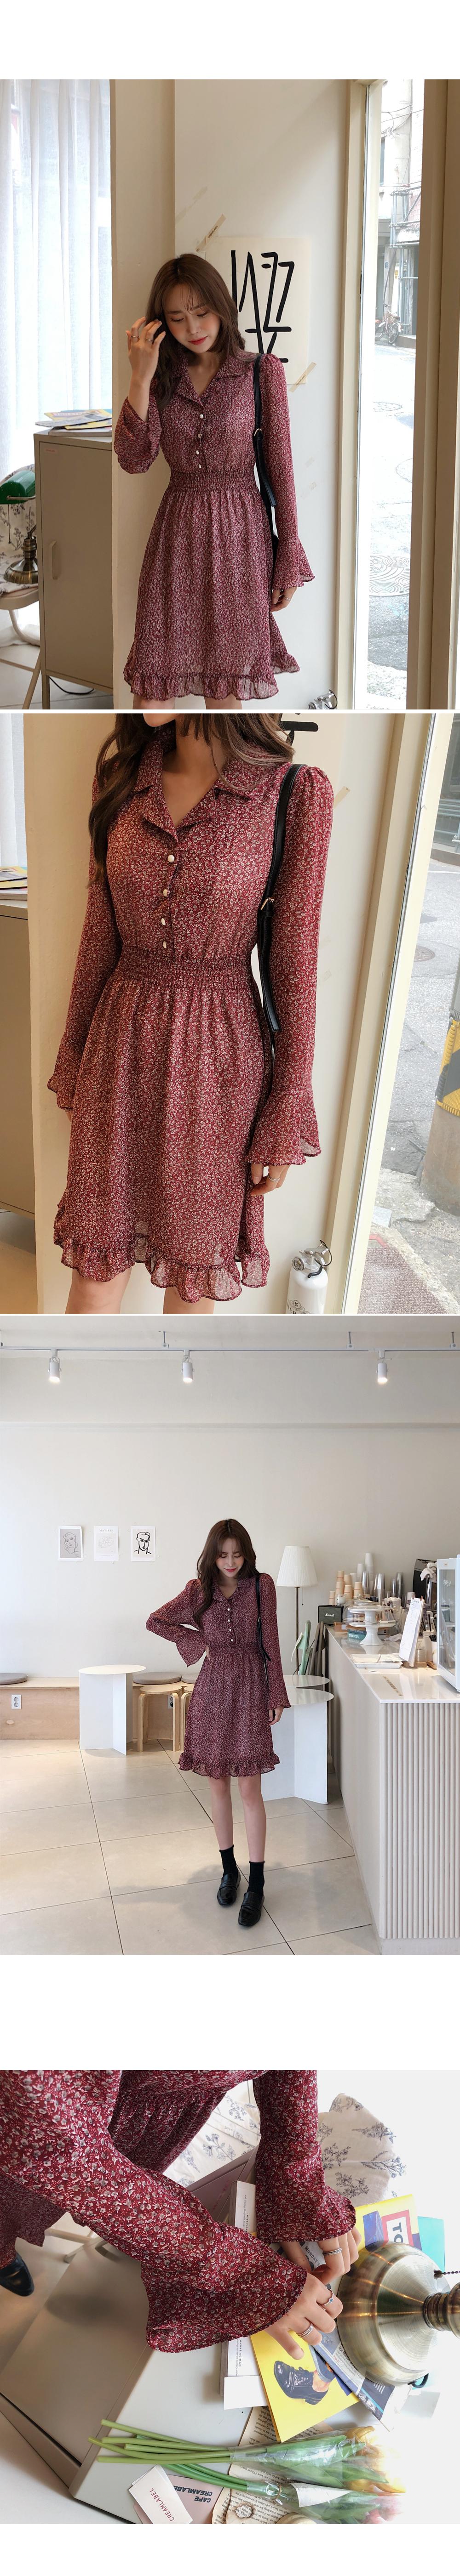 Fluttering ruffle dress